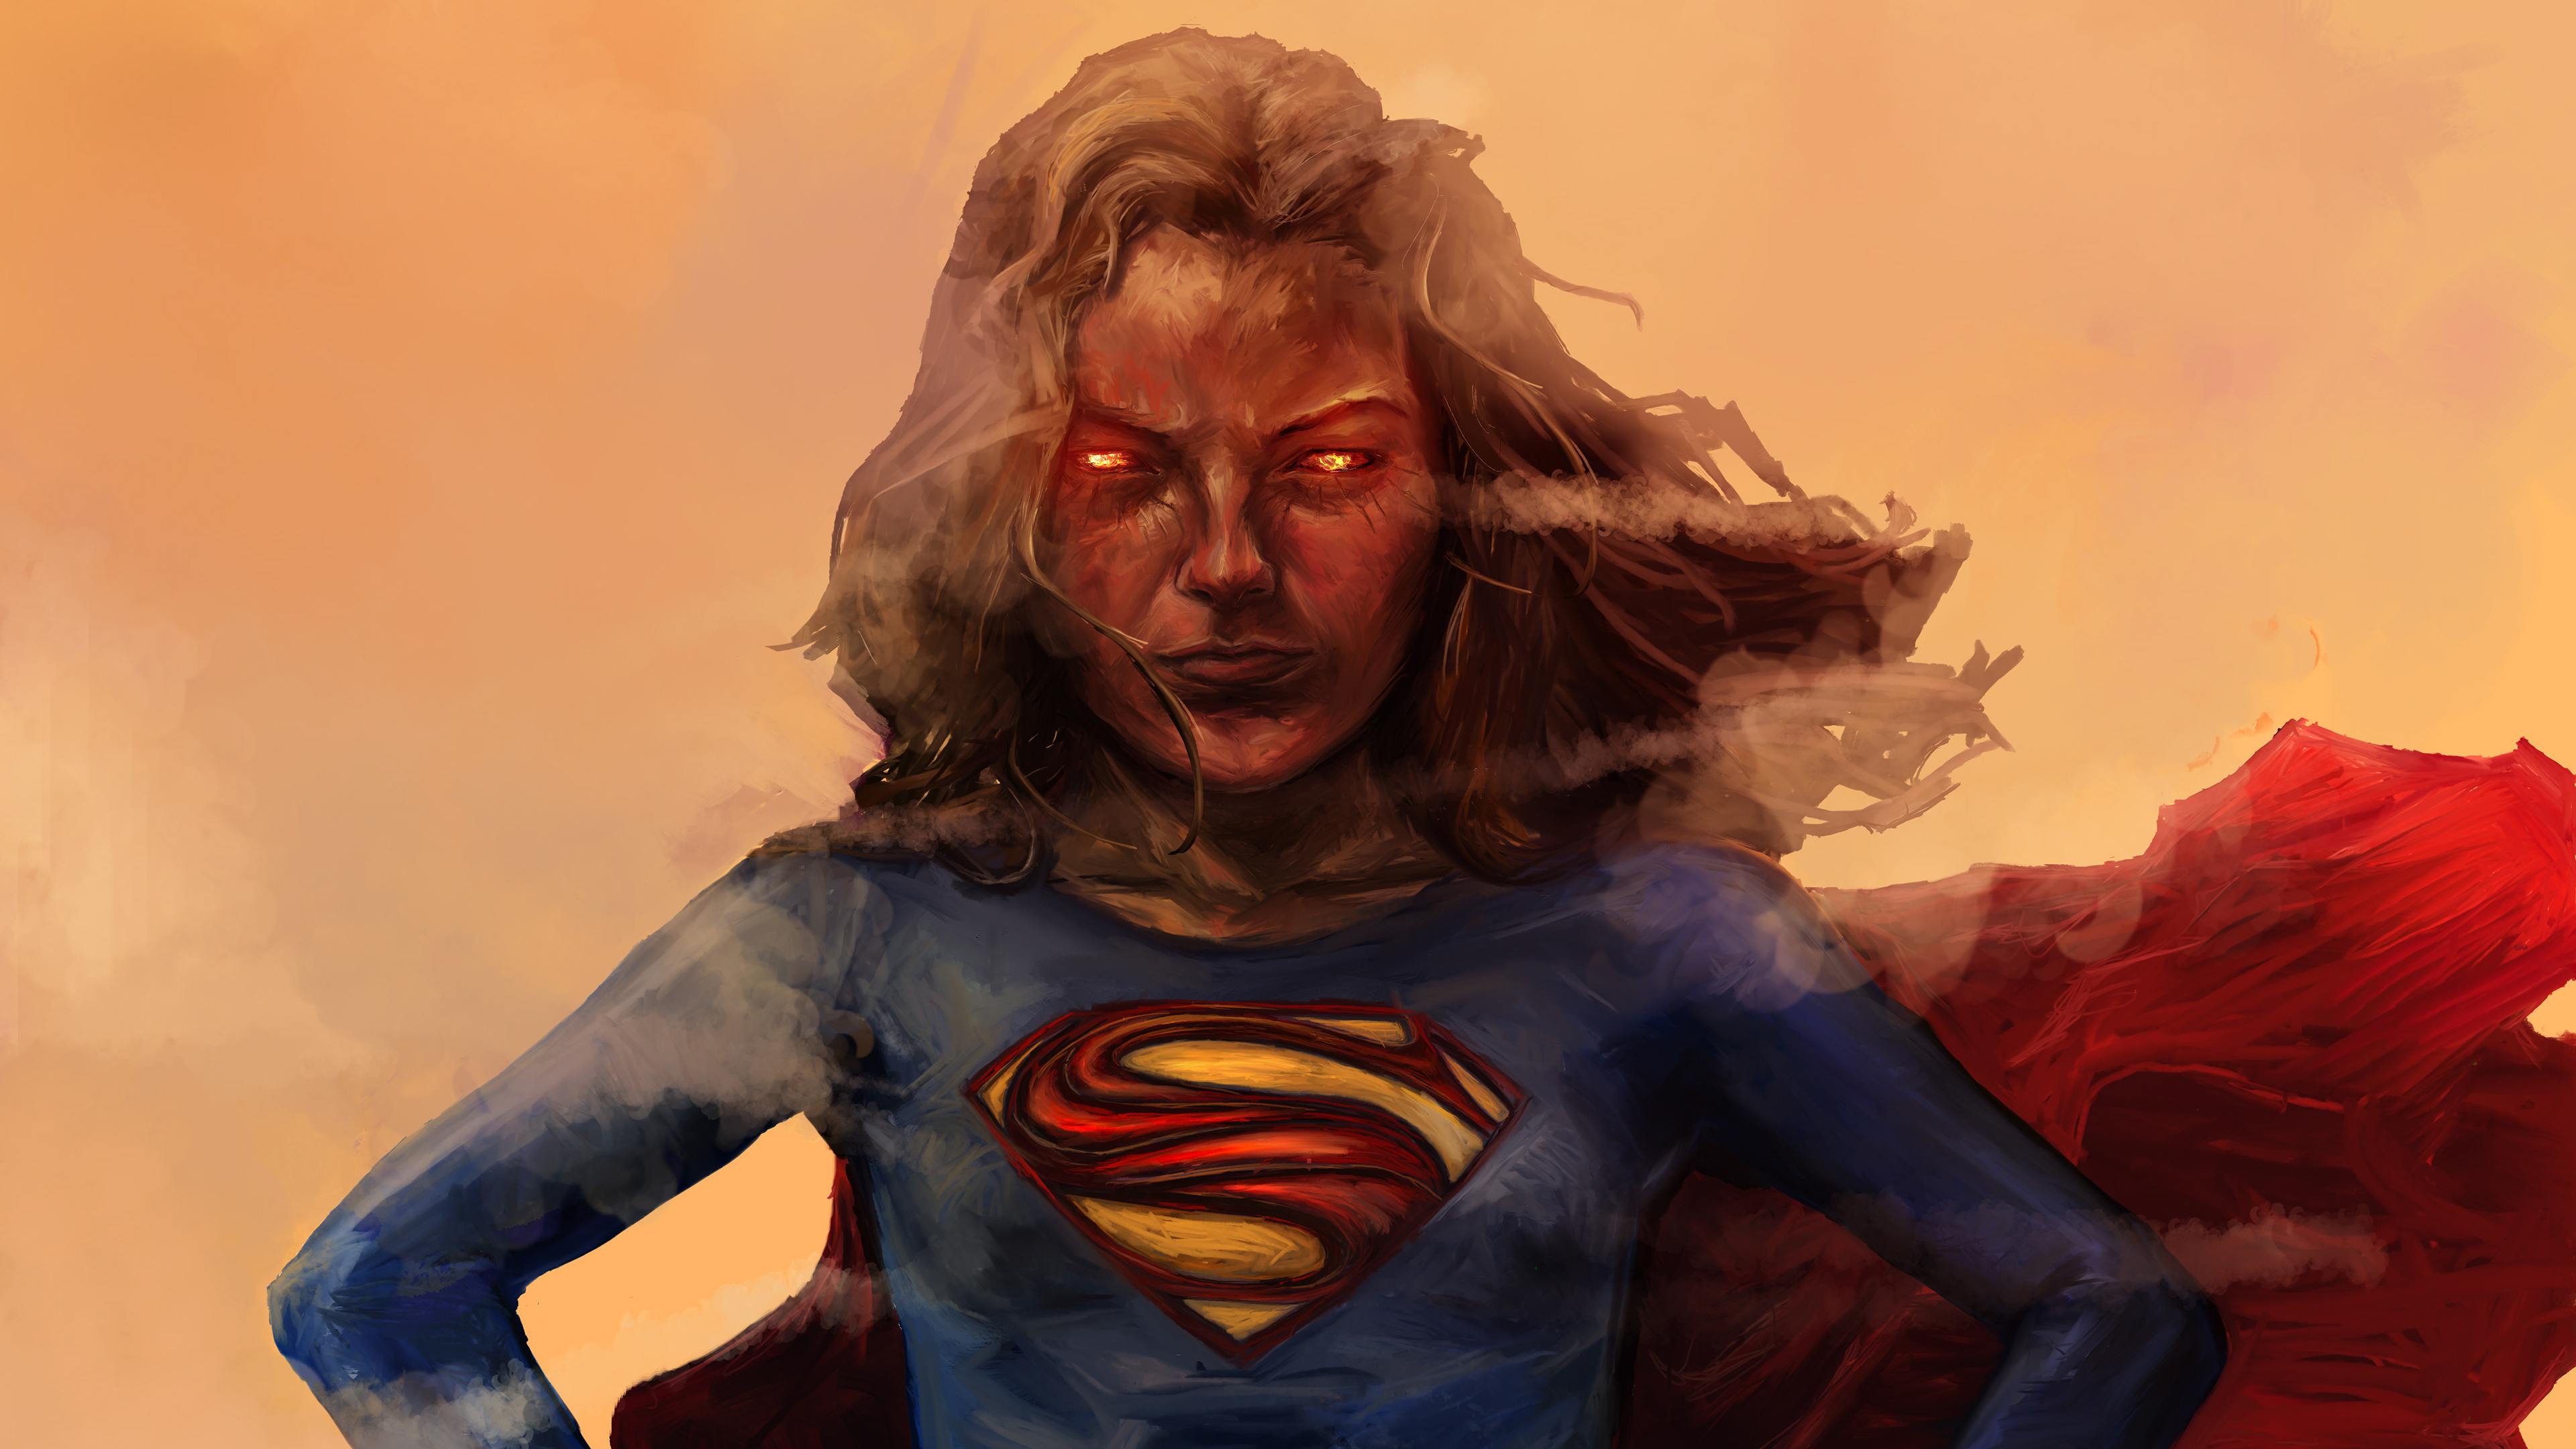 supergirl 4k 2018 1543620142 - Supergirl 4k 2018 - superheroes wallpapers, supergirl wallpapers, hd-wallpapers, digital art wallpapers, artwork wallpapers, 4k-wallpapers